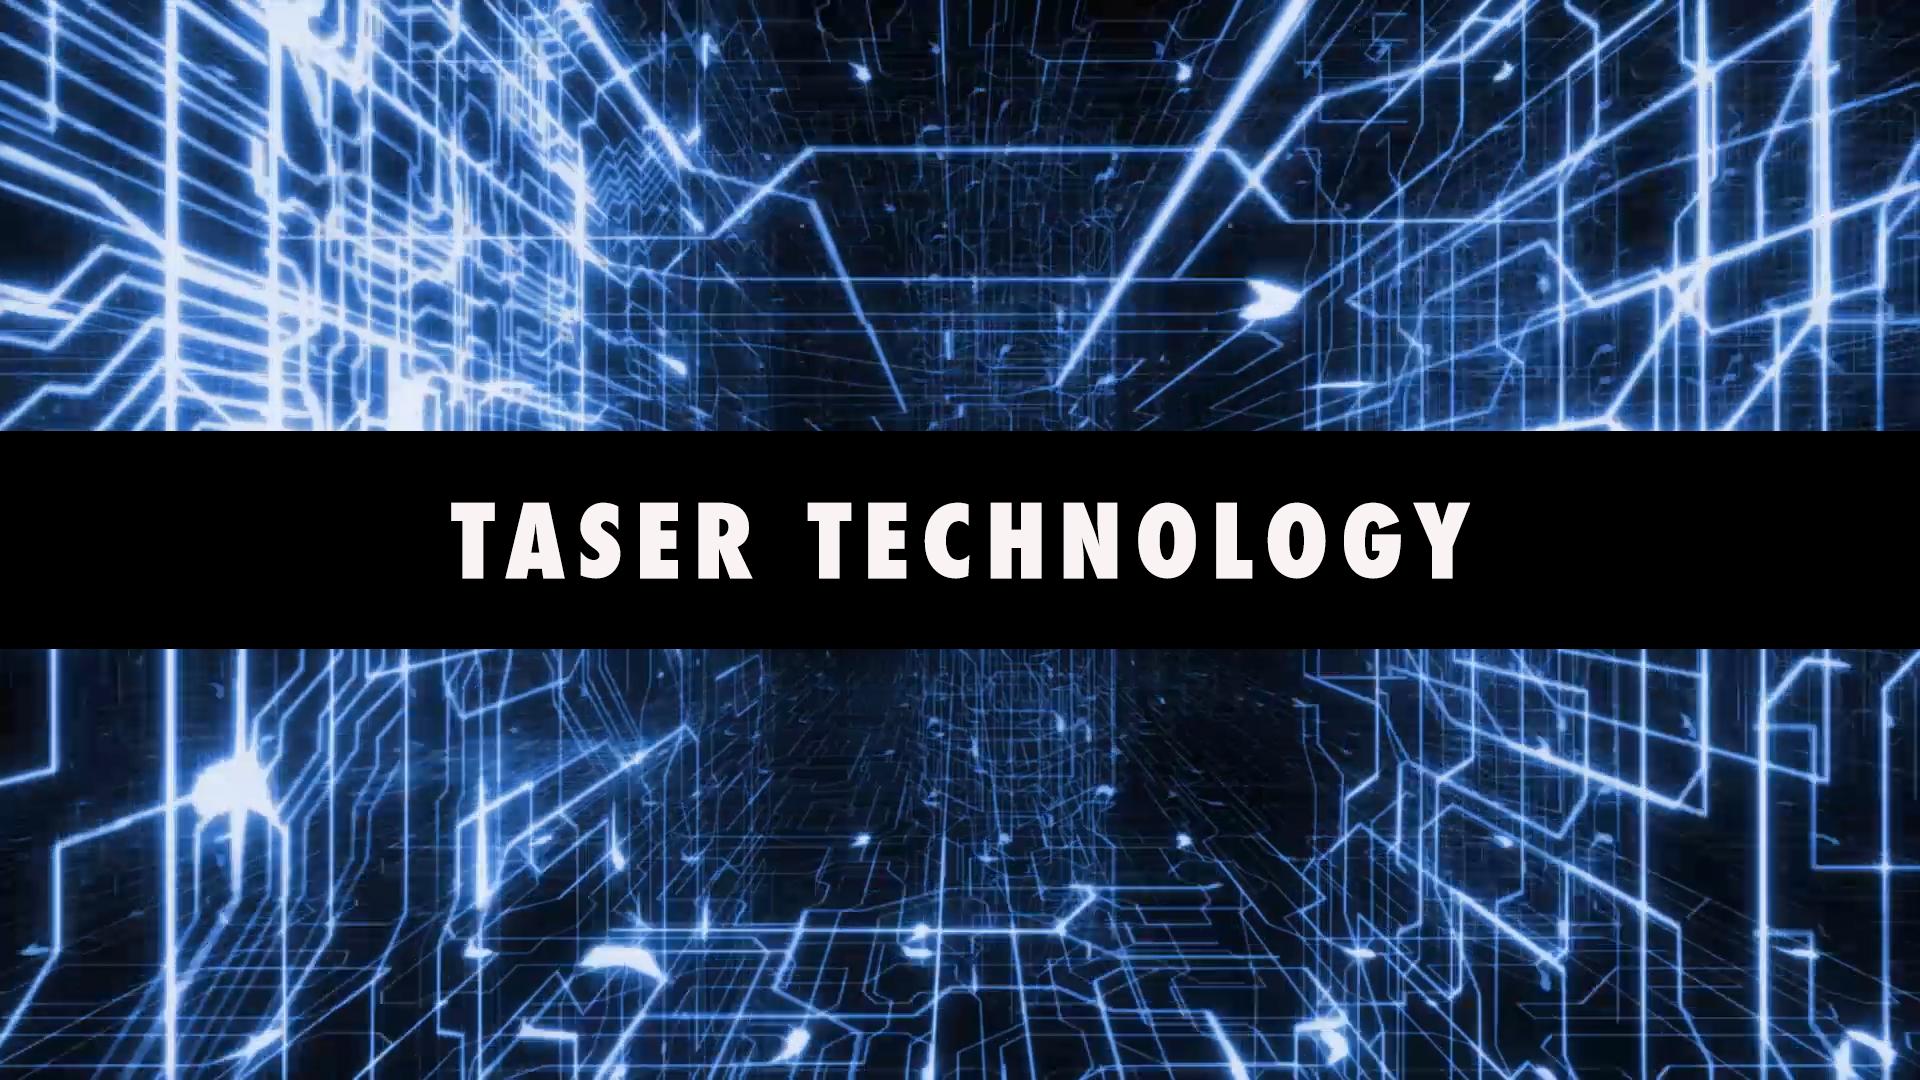 _thumbnail_taser_technology.png